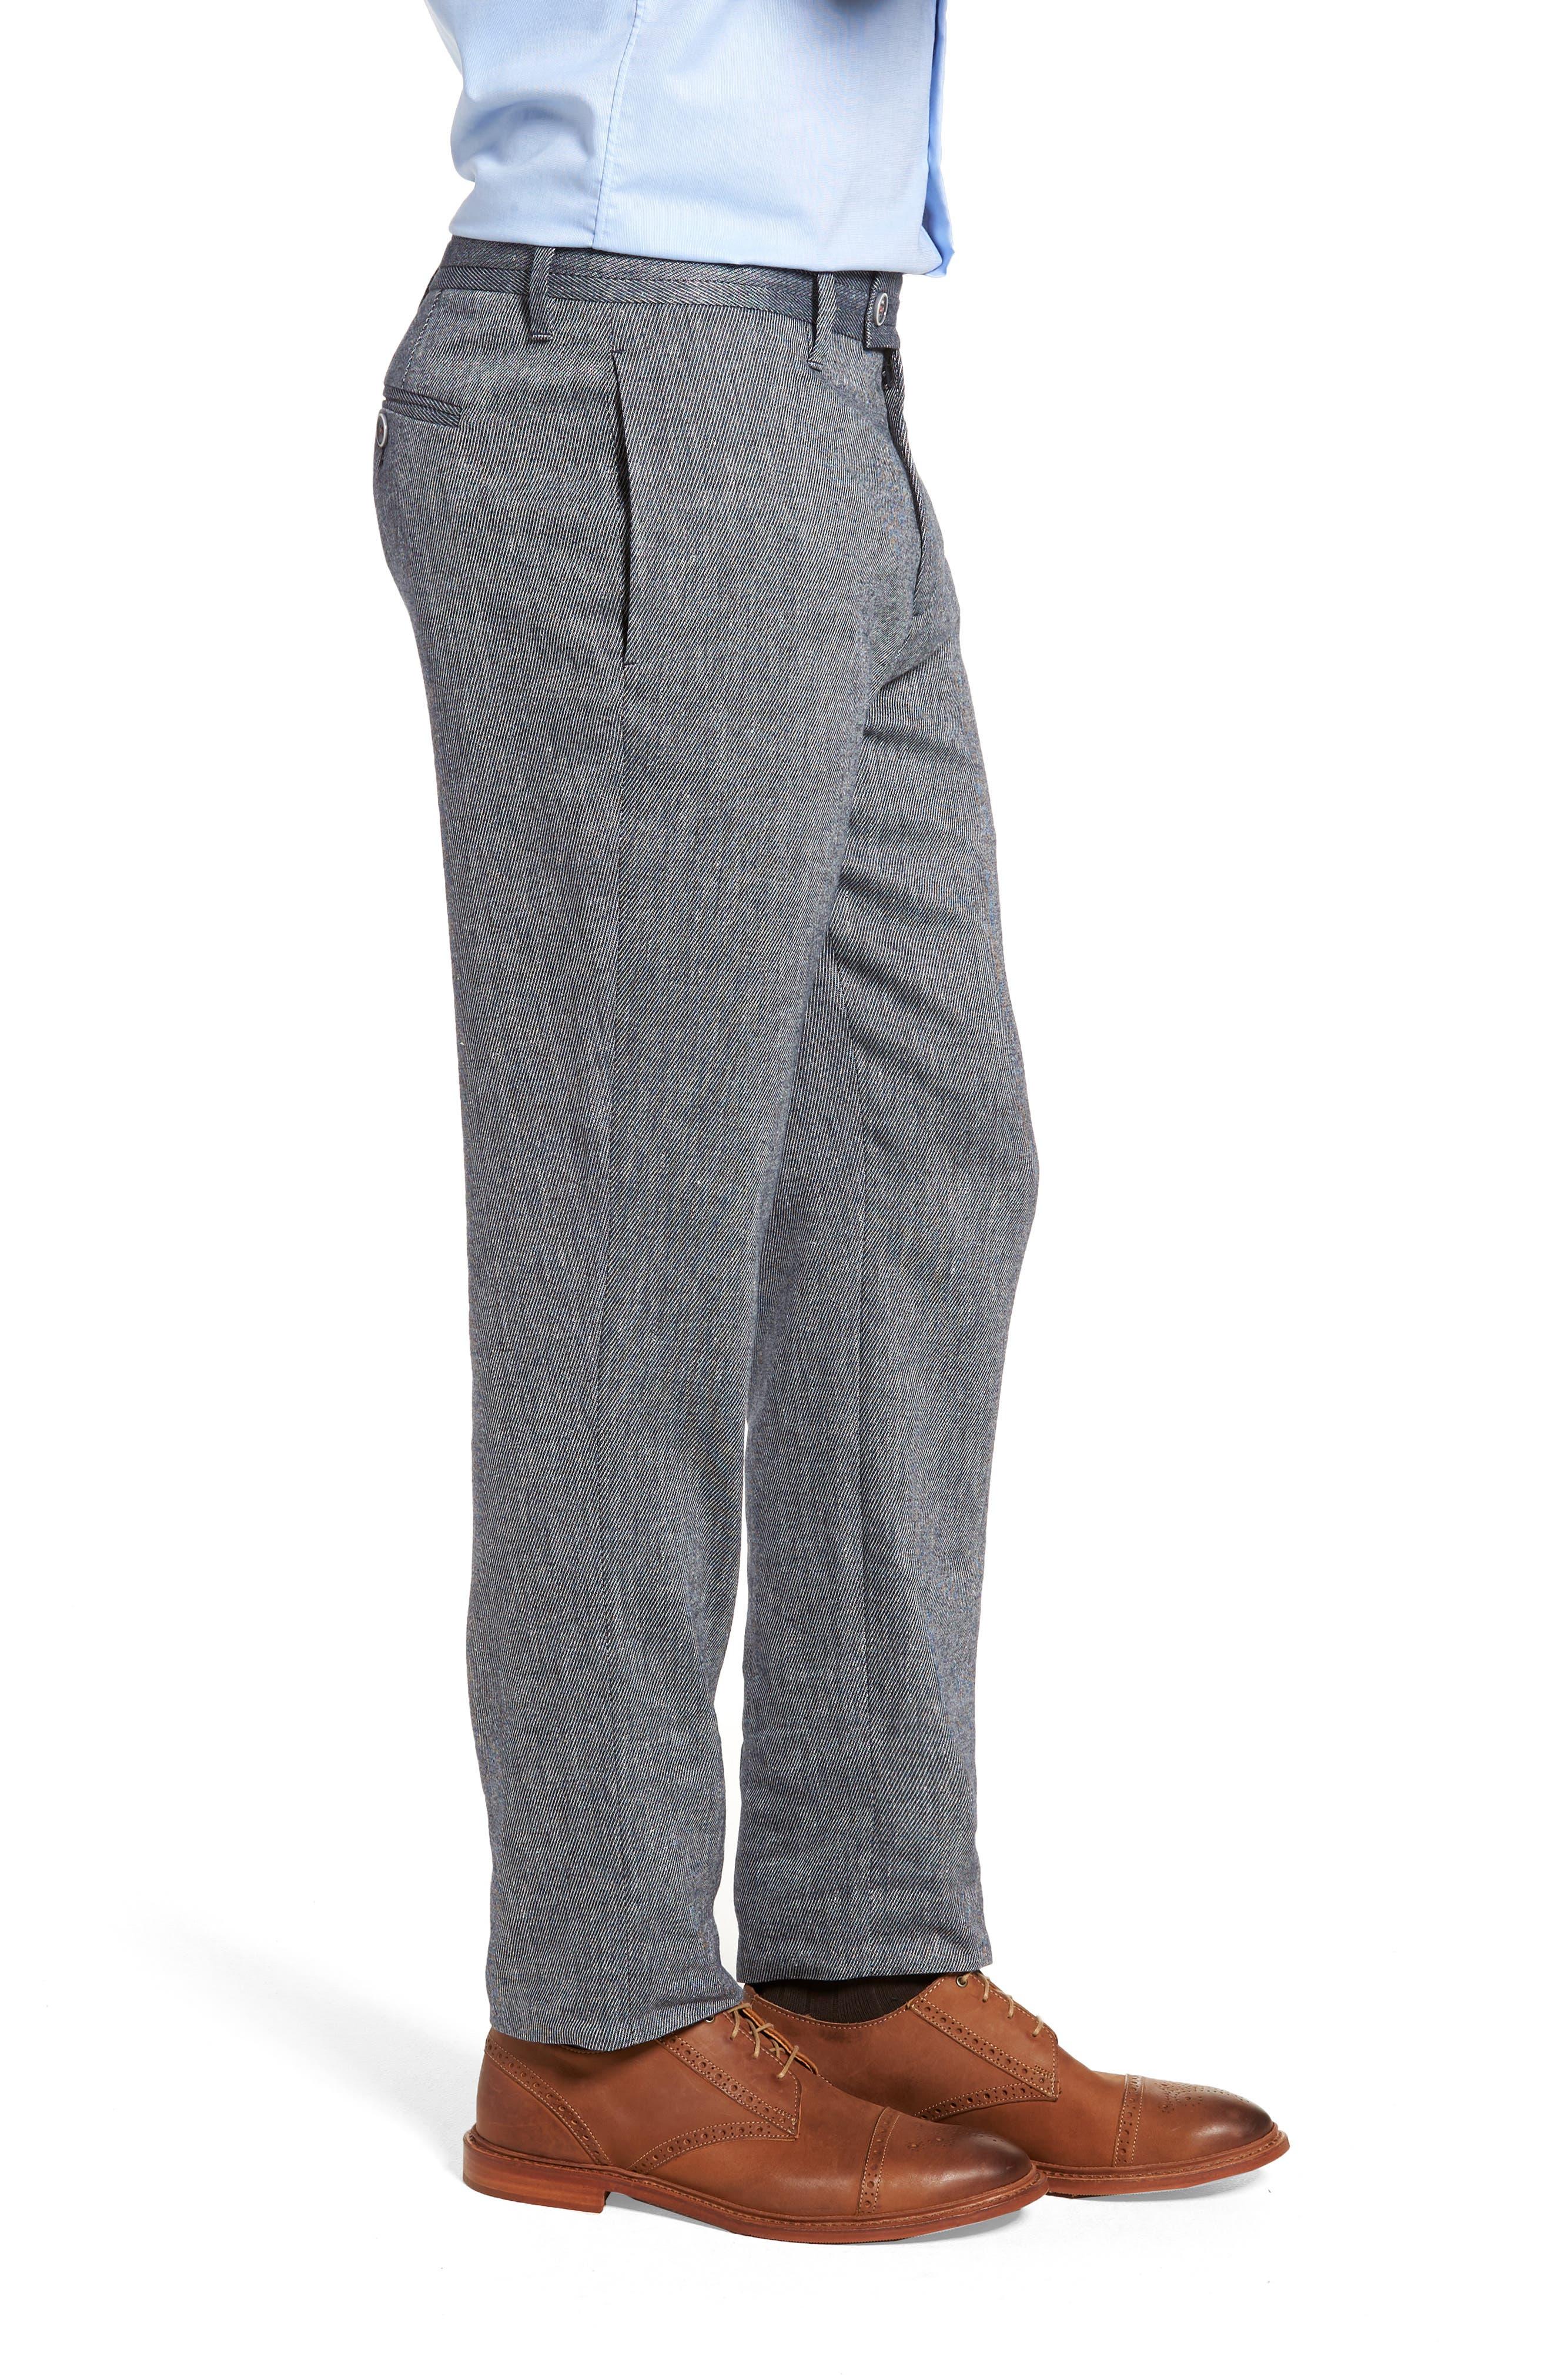 Clifrot Trim Fit Trousers,                             Alternate thumbnail 3, color,                             Blue